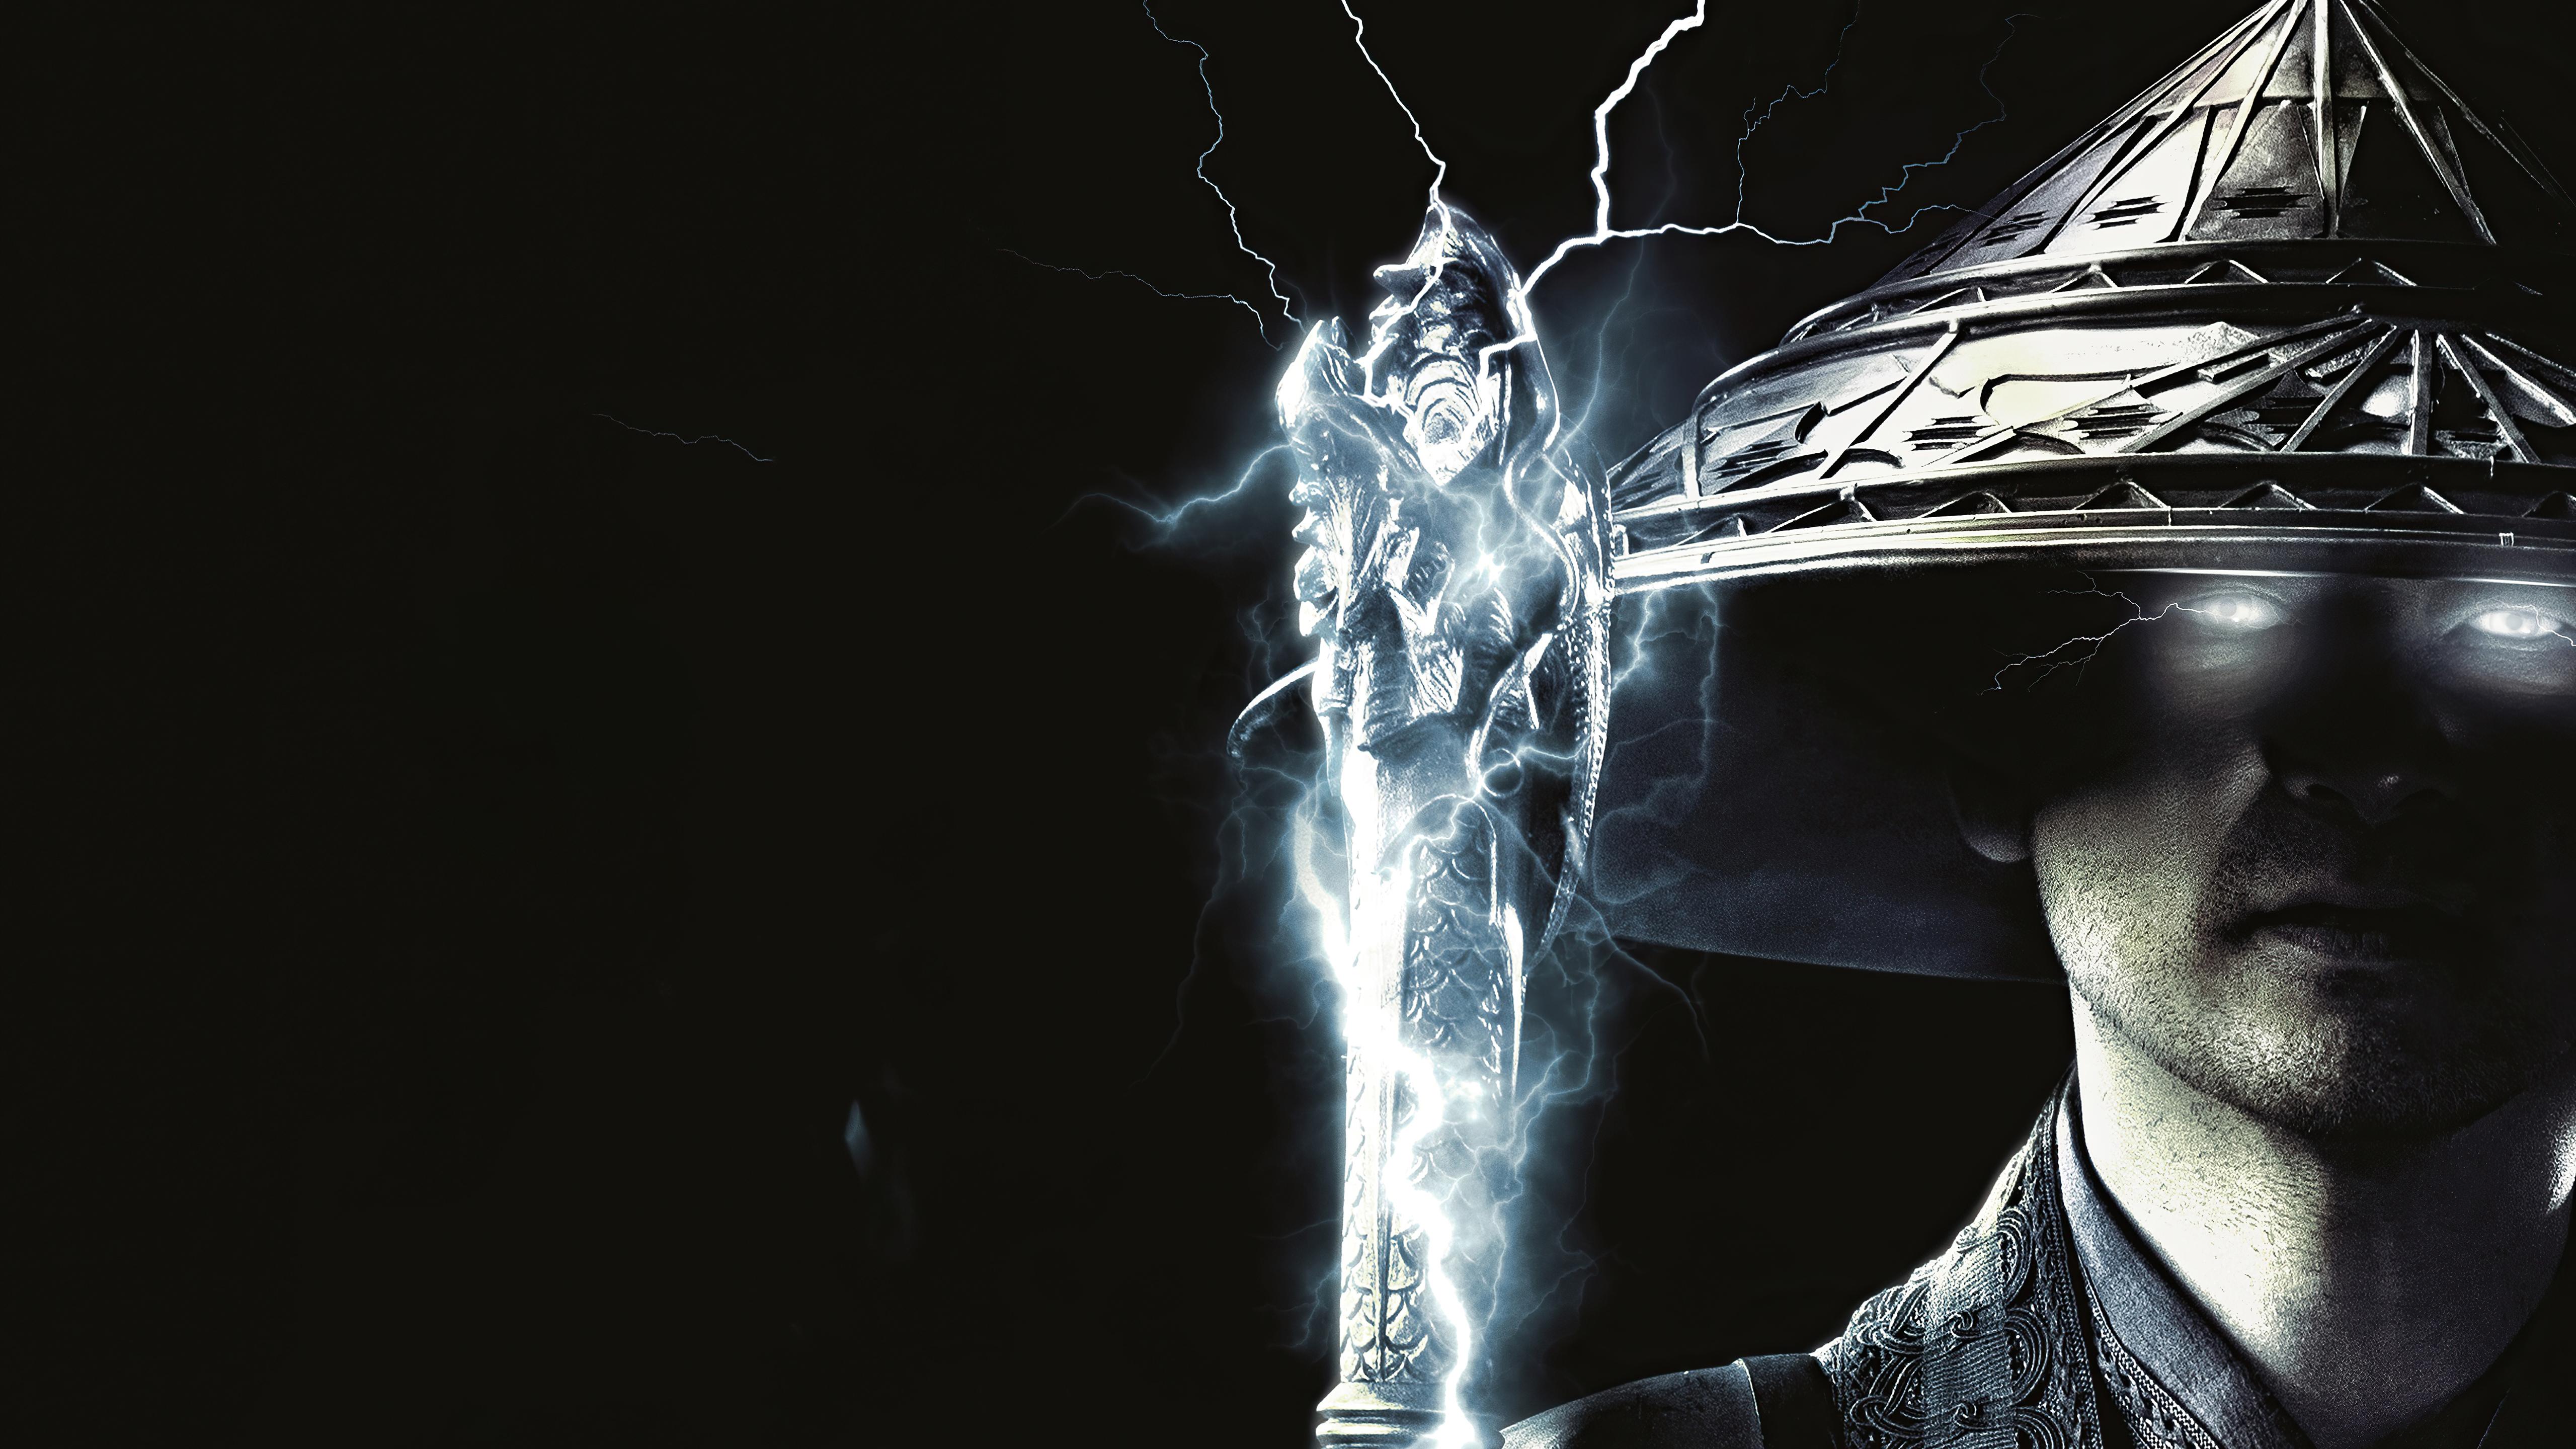 tadanobu asano as raiden mortal kombat movie 4k 1617449288 - Tadanobu Asano As Raiden Mortal Kombat Movie 4k - Tadanobu Asano As Raiden Mortal Kombat Movie 4k wallpapers